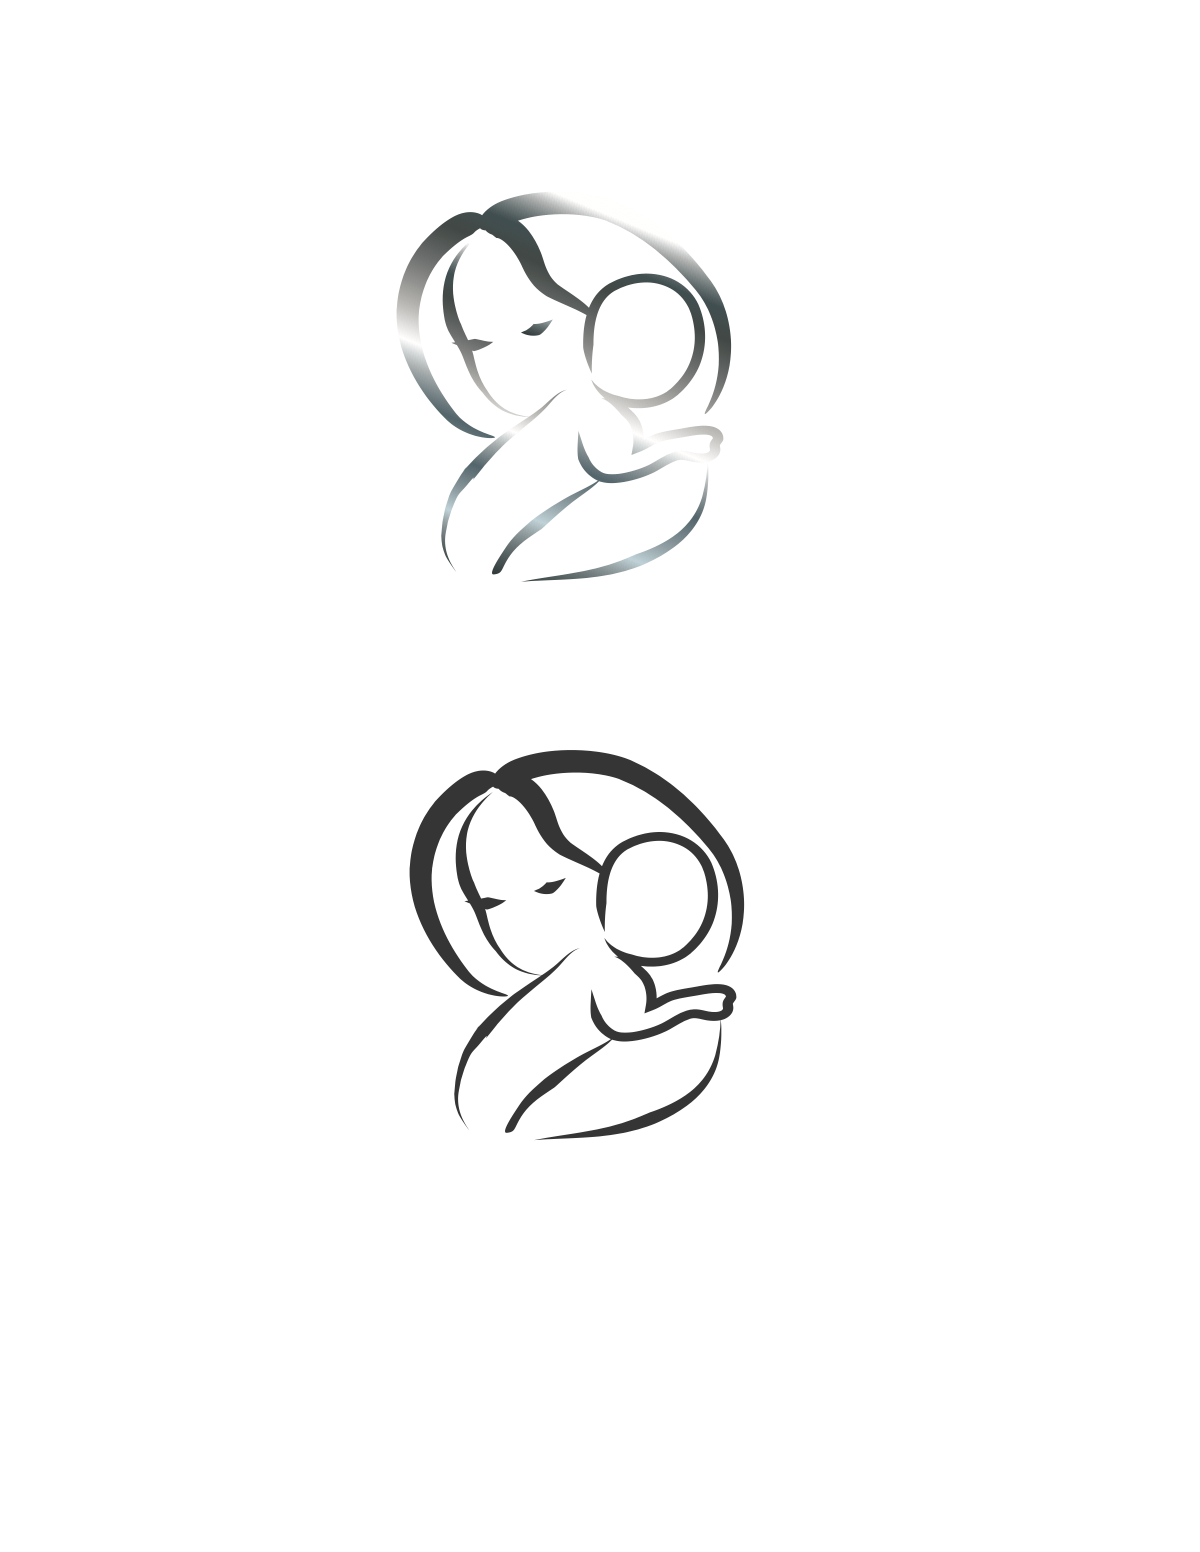 JoySpring Envelop & Forms